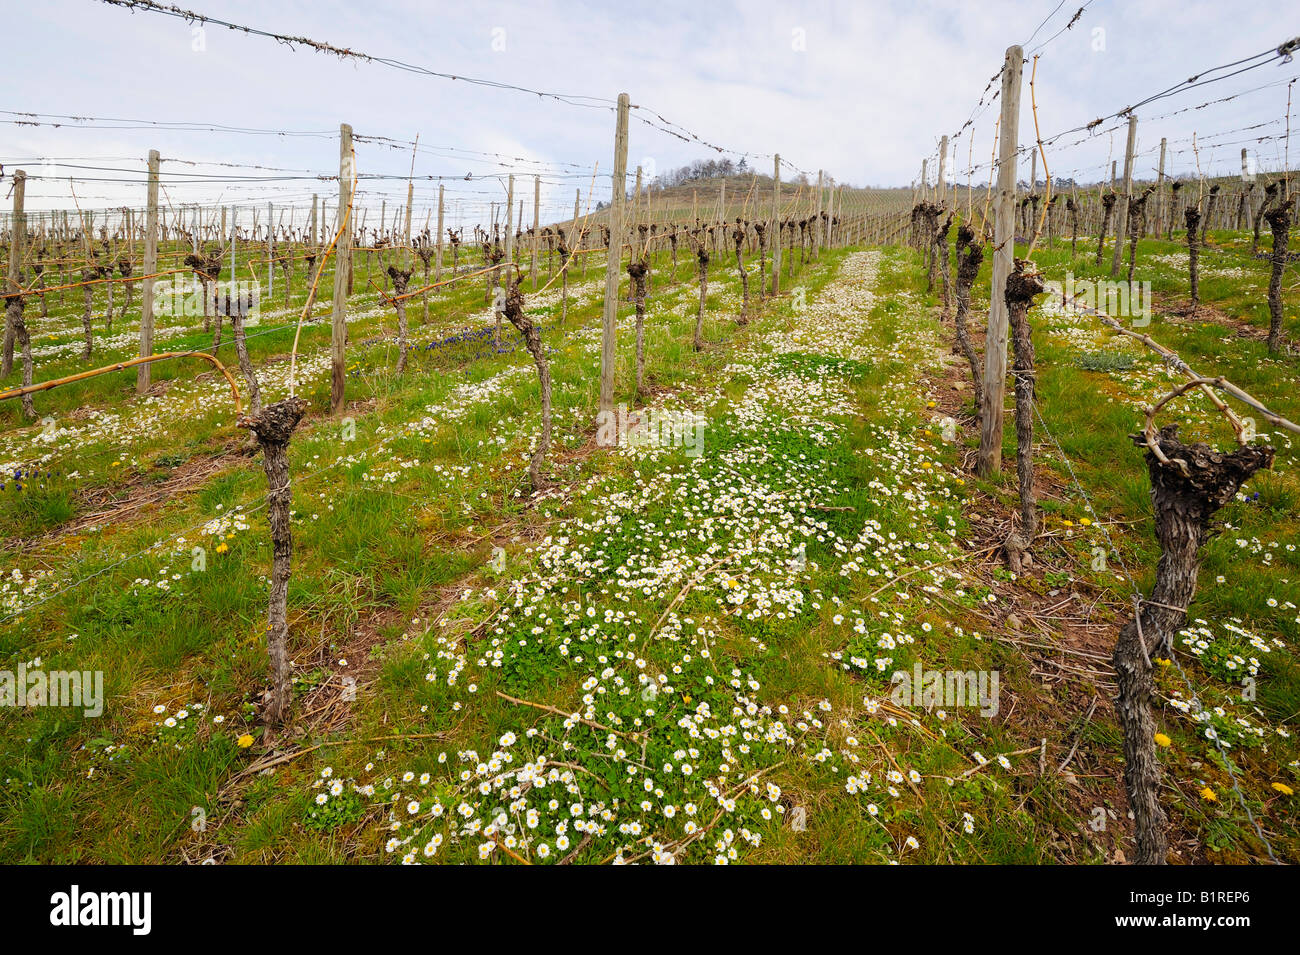 A vineyard with daisies after pruning in spring, Kleinheppacher Kopf by Stuttgart, Baden-Wuerttemberg, Germany, Stock Photo